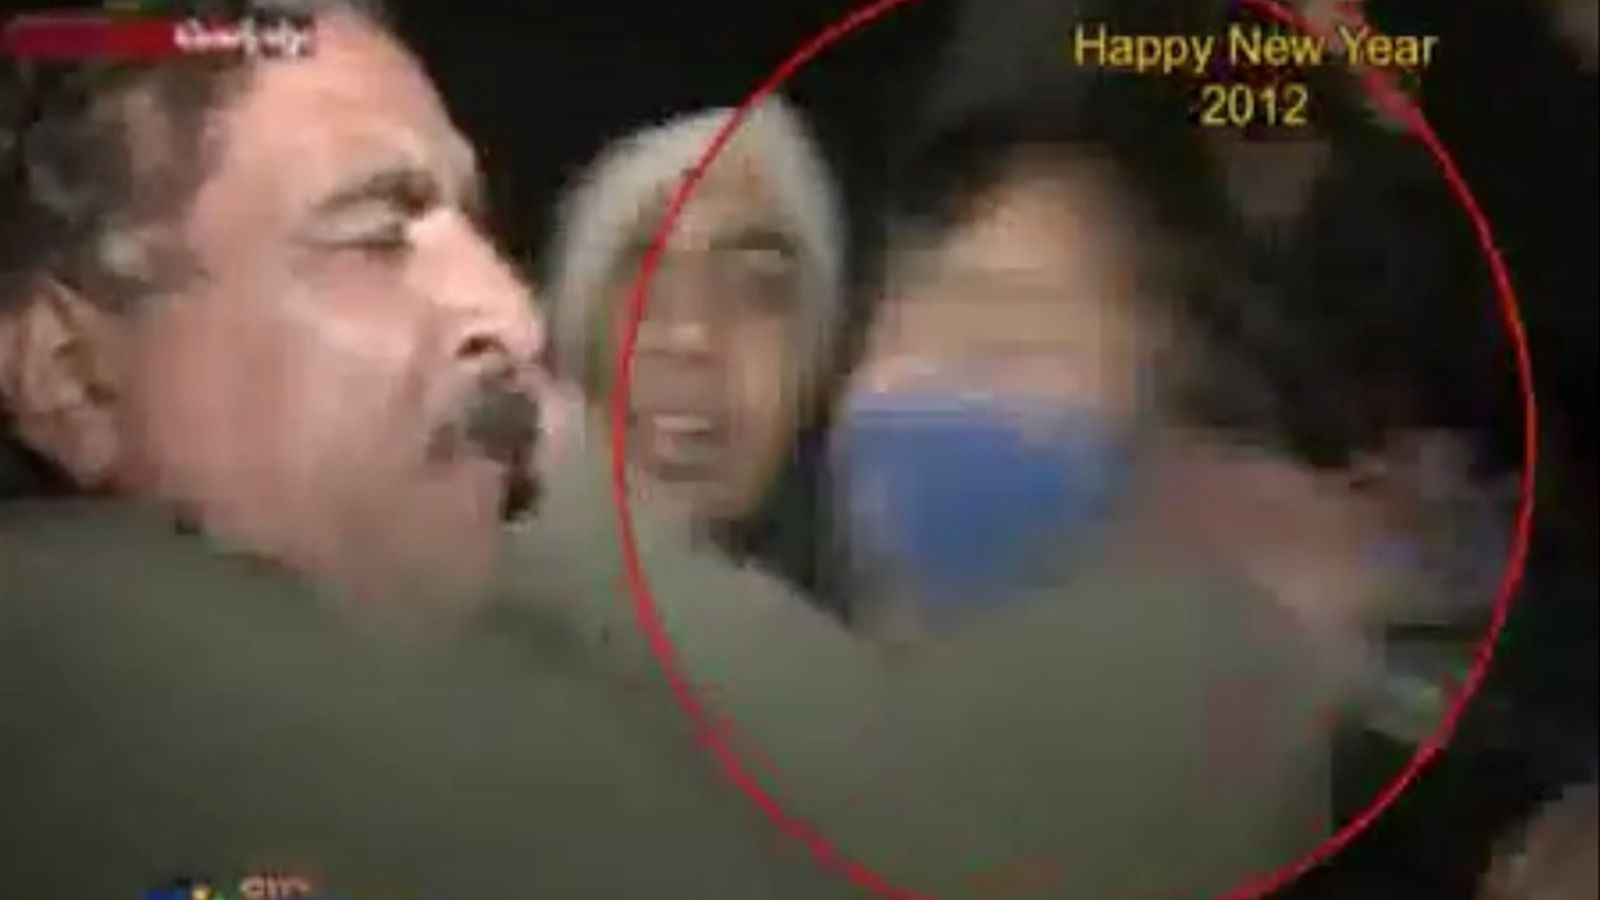 Un reporter de la televisió paquistanesa pega un noi a la cara en una connexió en directe